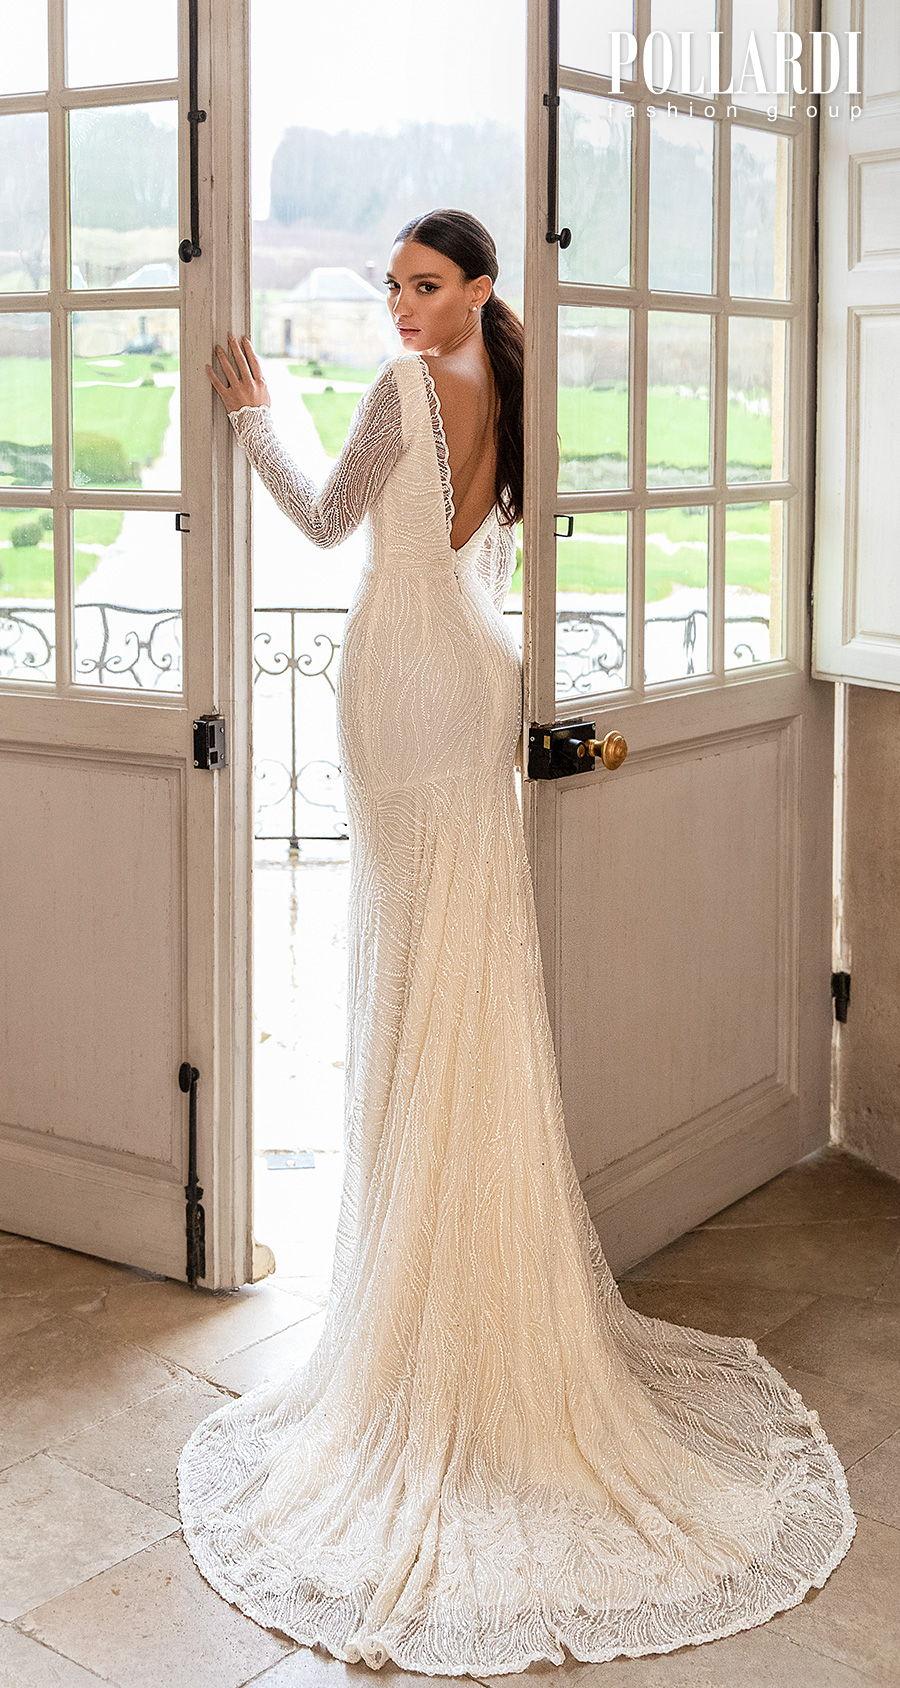 pollardi 2021 royalty bridal long sleeves bateau neck full embellishment beaded elegant glamorous fit and flare wedding dress low v back short train (gentility) bv